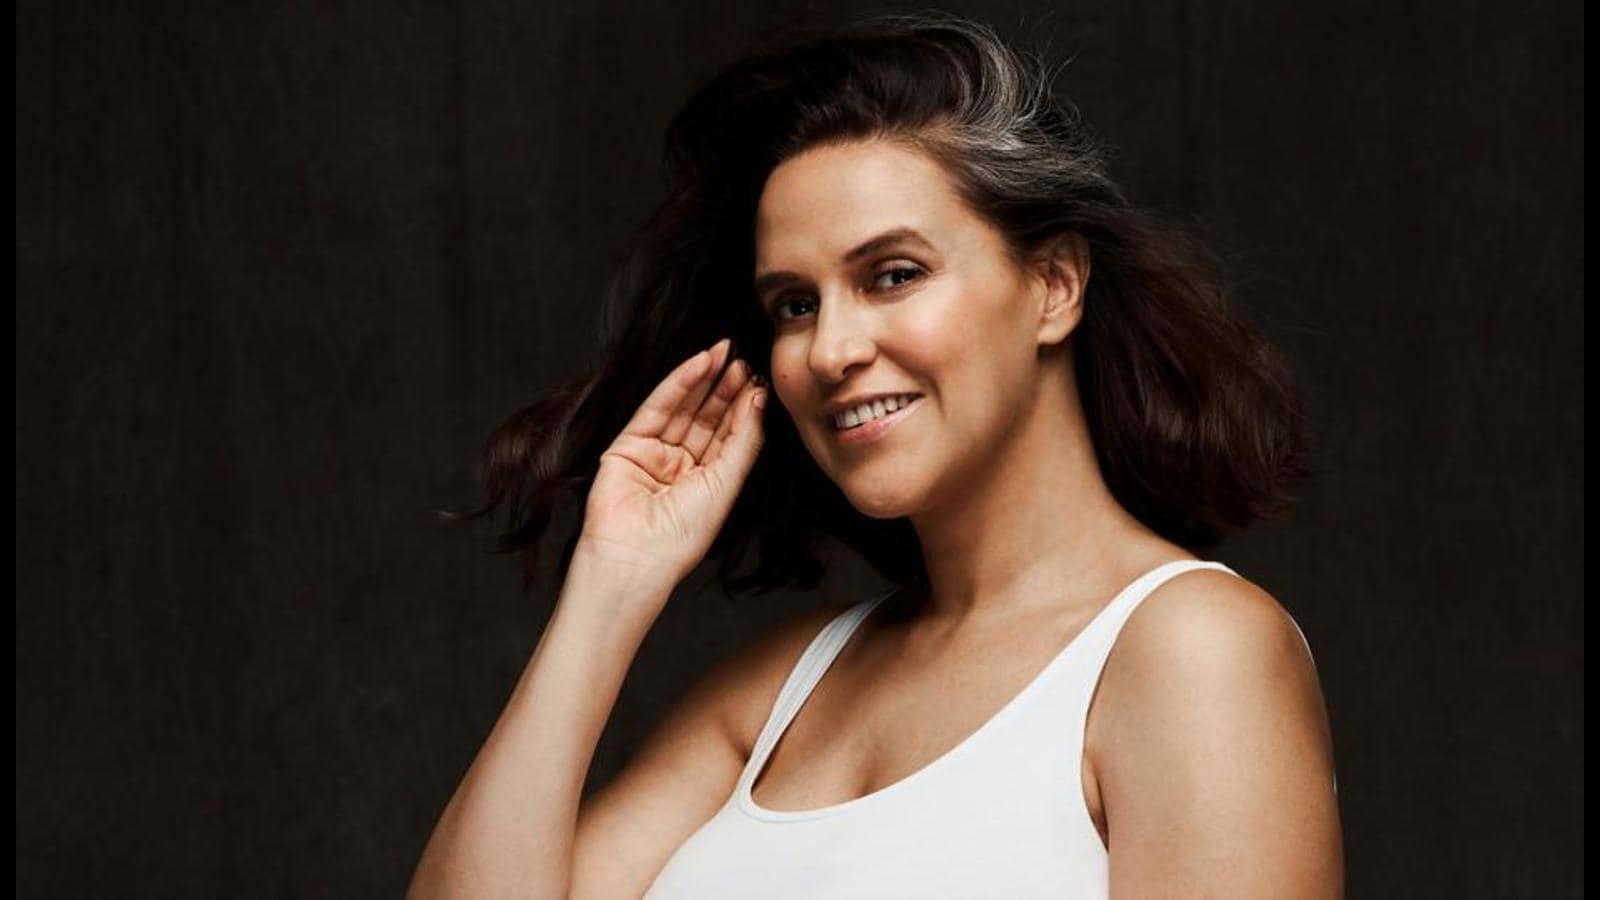 Exclusive | Neha Dhupia: I Was Pregnant When Angad Got Covid | Bollywood -  Hindustan Times